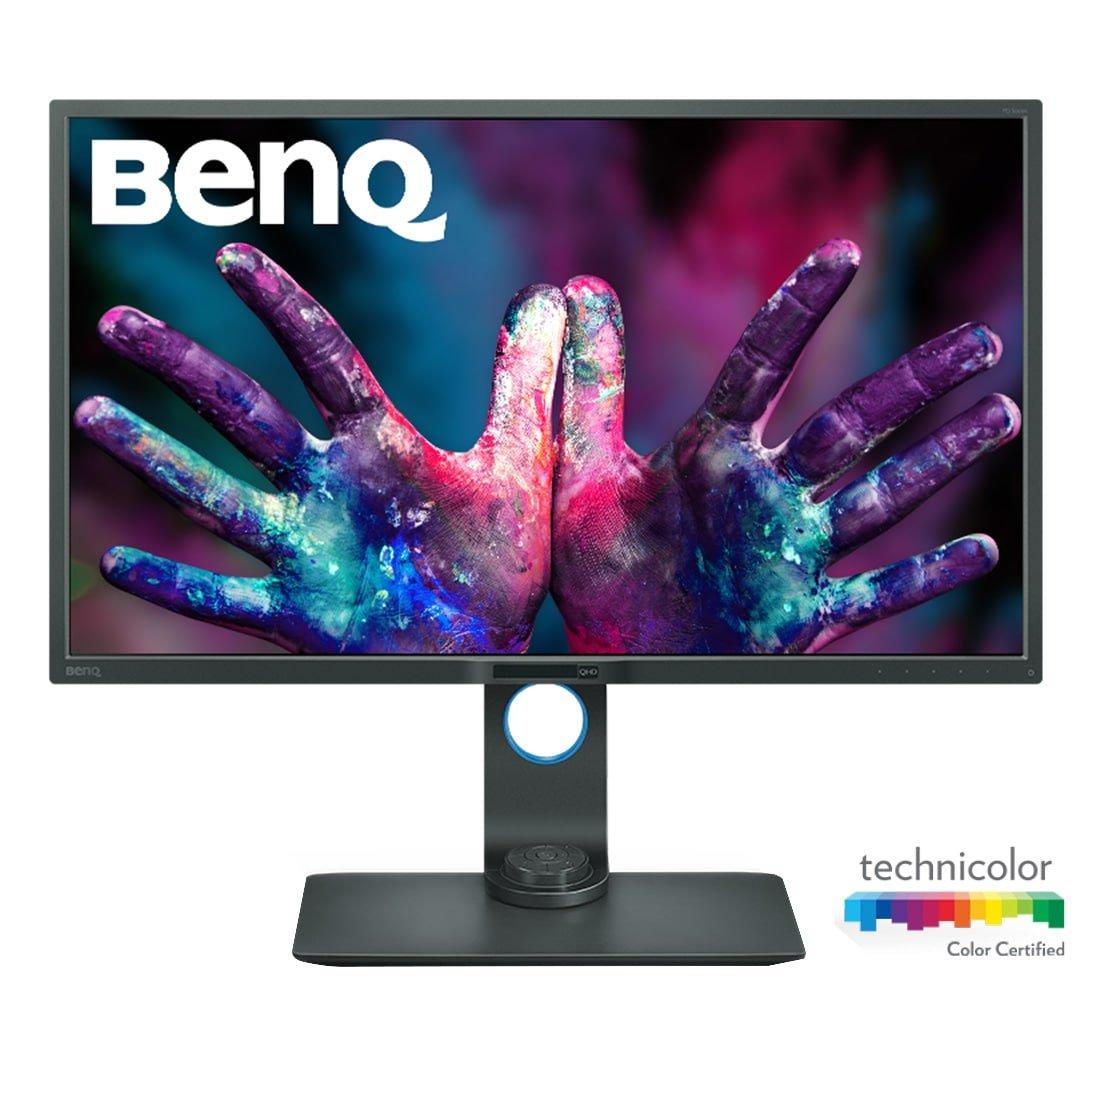 "BenQ - PD3200Q - 32"" (81,28 cm) - 2560x1440 (QHD)"